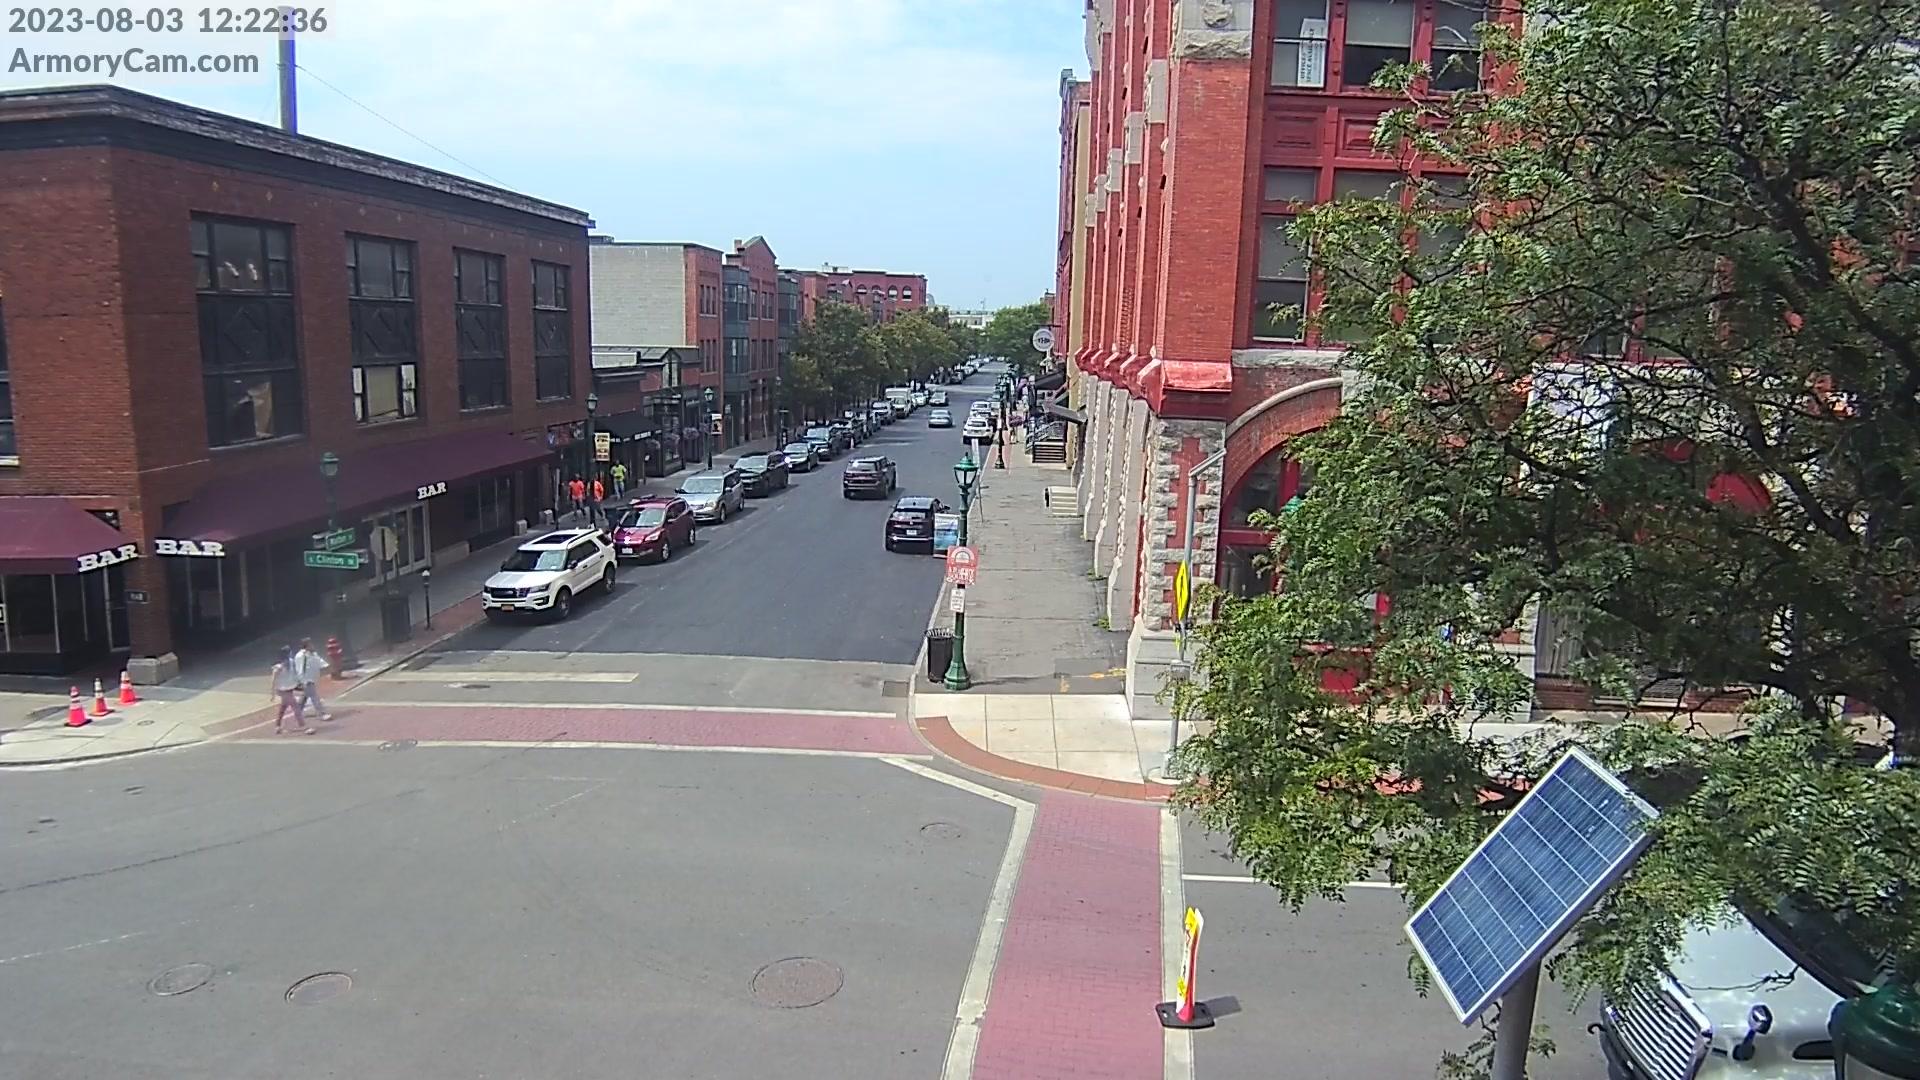 Current Camera Image